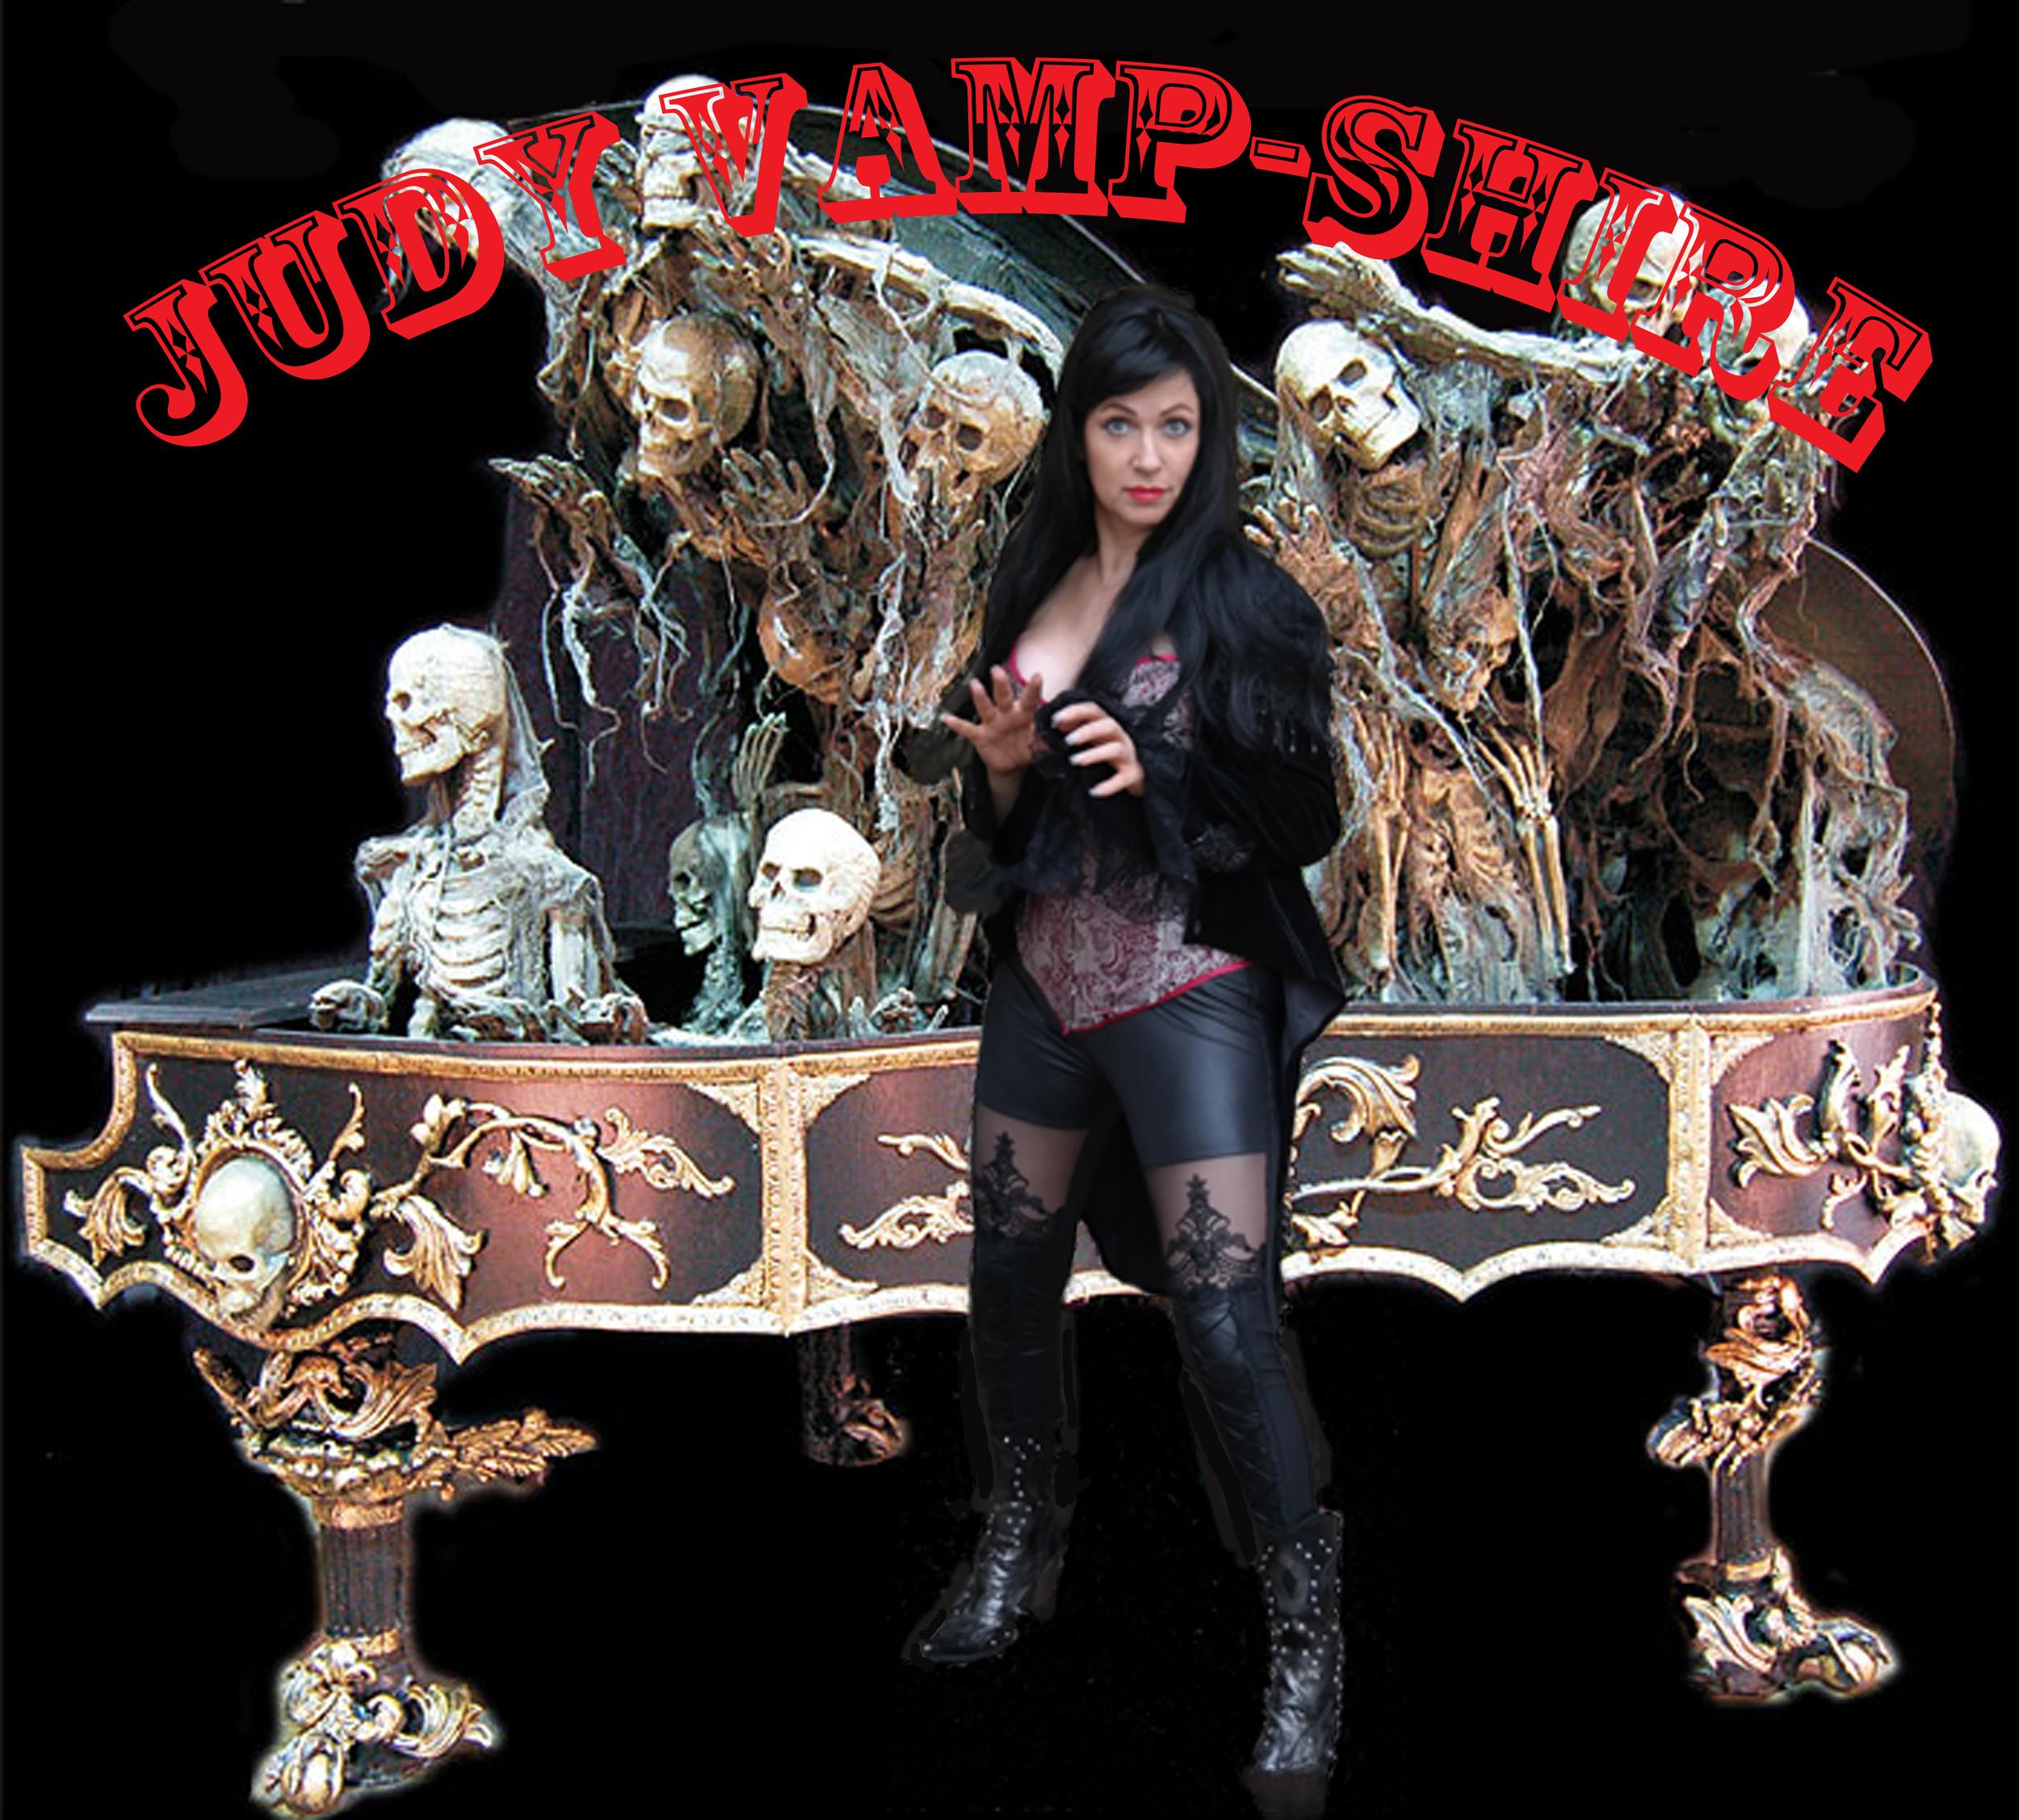 judy-vampire-piano-2_edited-1 copy.jpg